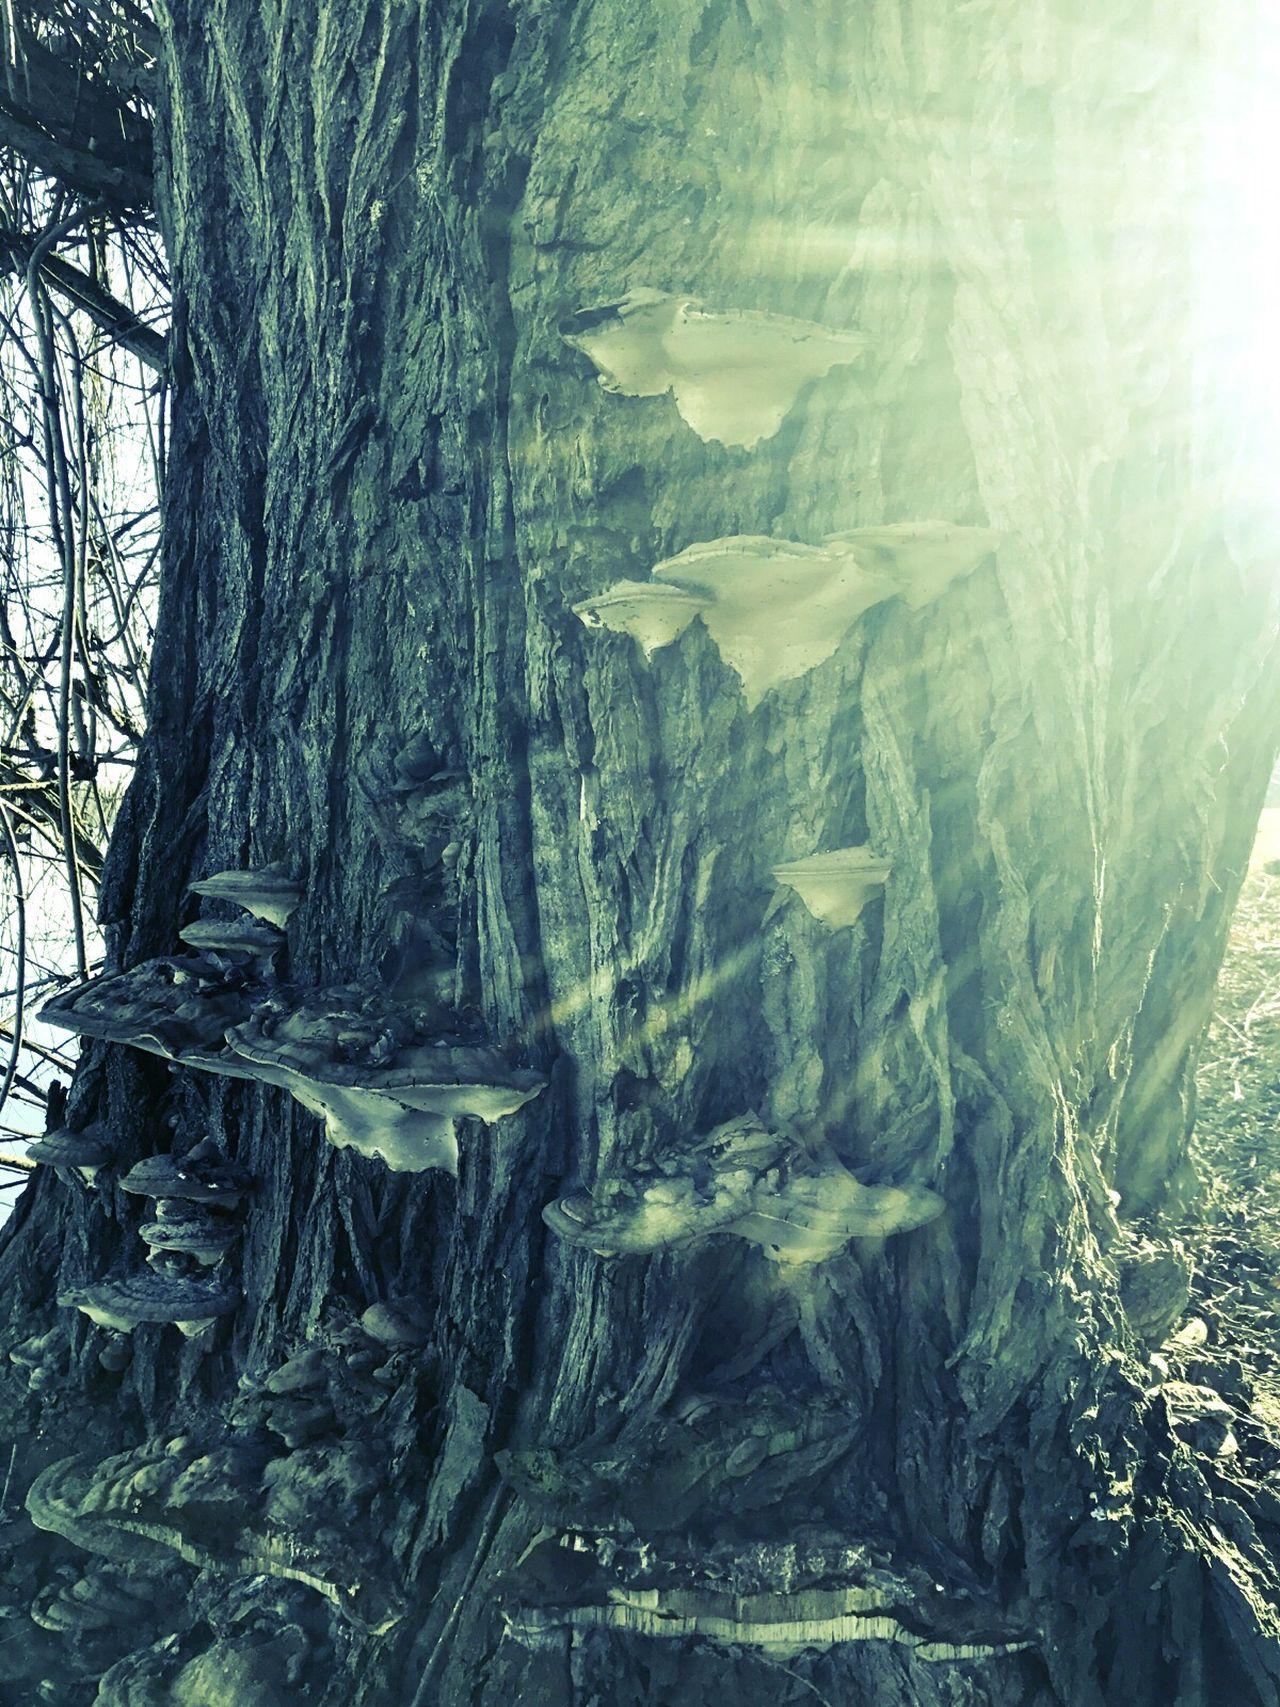 Tree Beauty In Nature Nature Baumstamm Tree Trunk Wald Pilze Fantasy Magical Magic Elf Elf Fantasy Fair Elfenbaum Sunlight Scenics EyEmNature Mysterious EyeEmNewHere